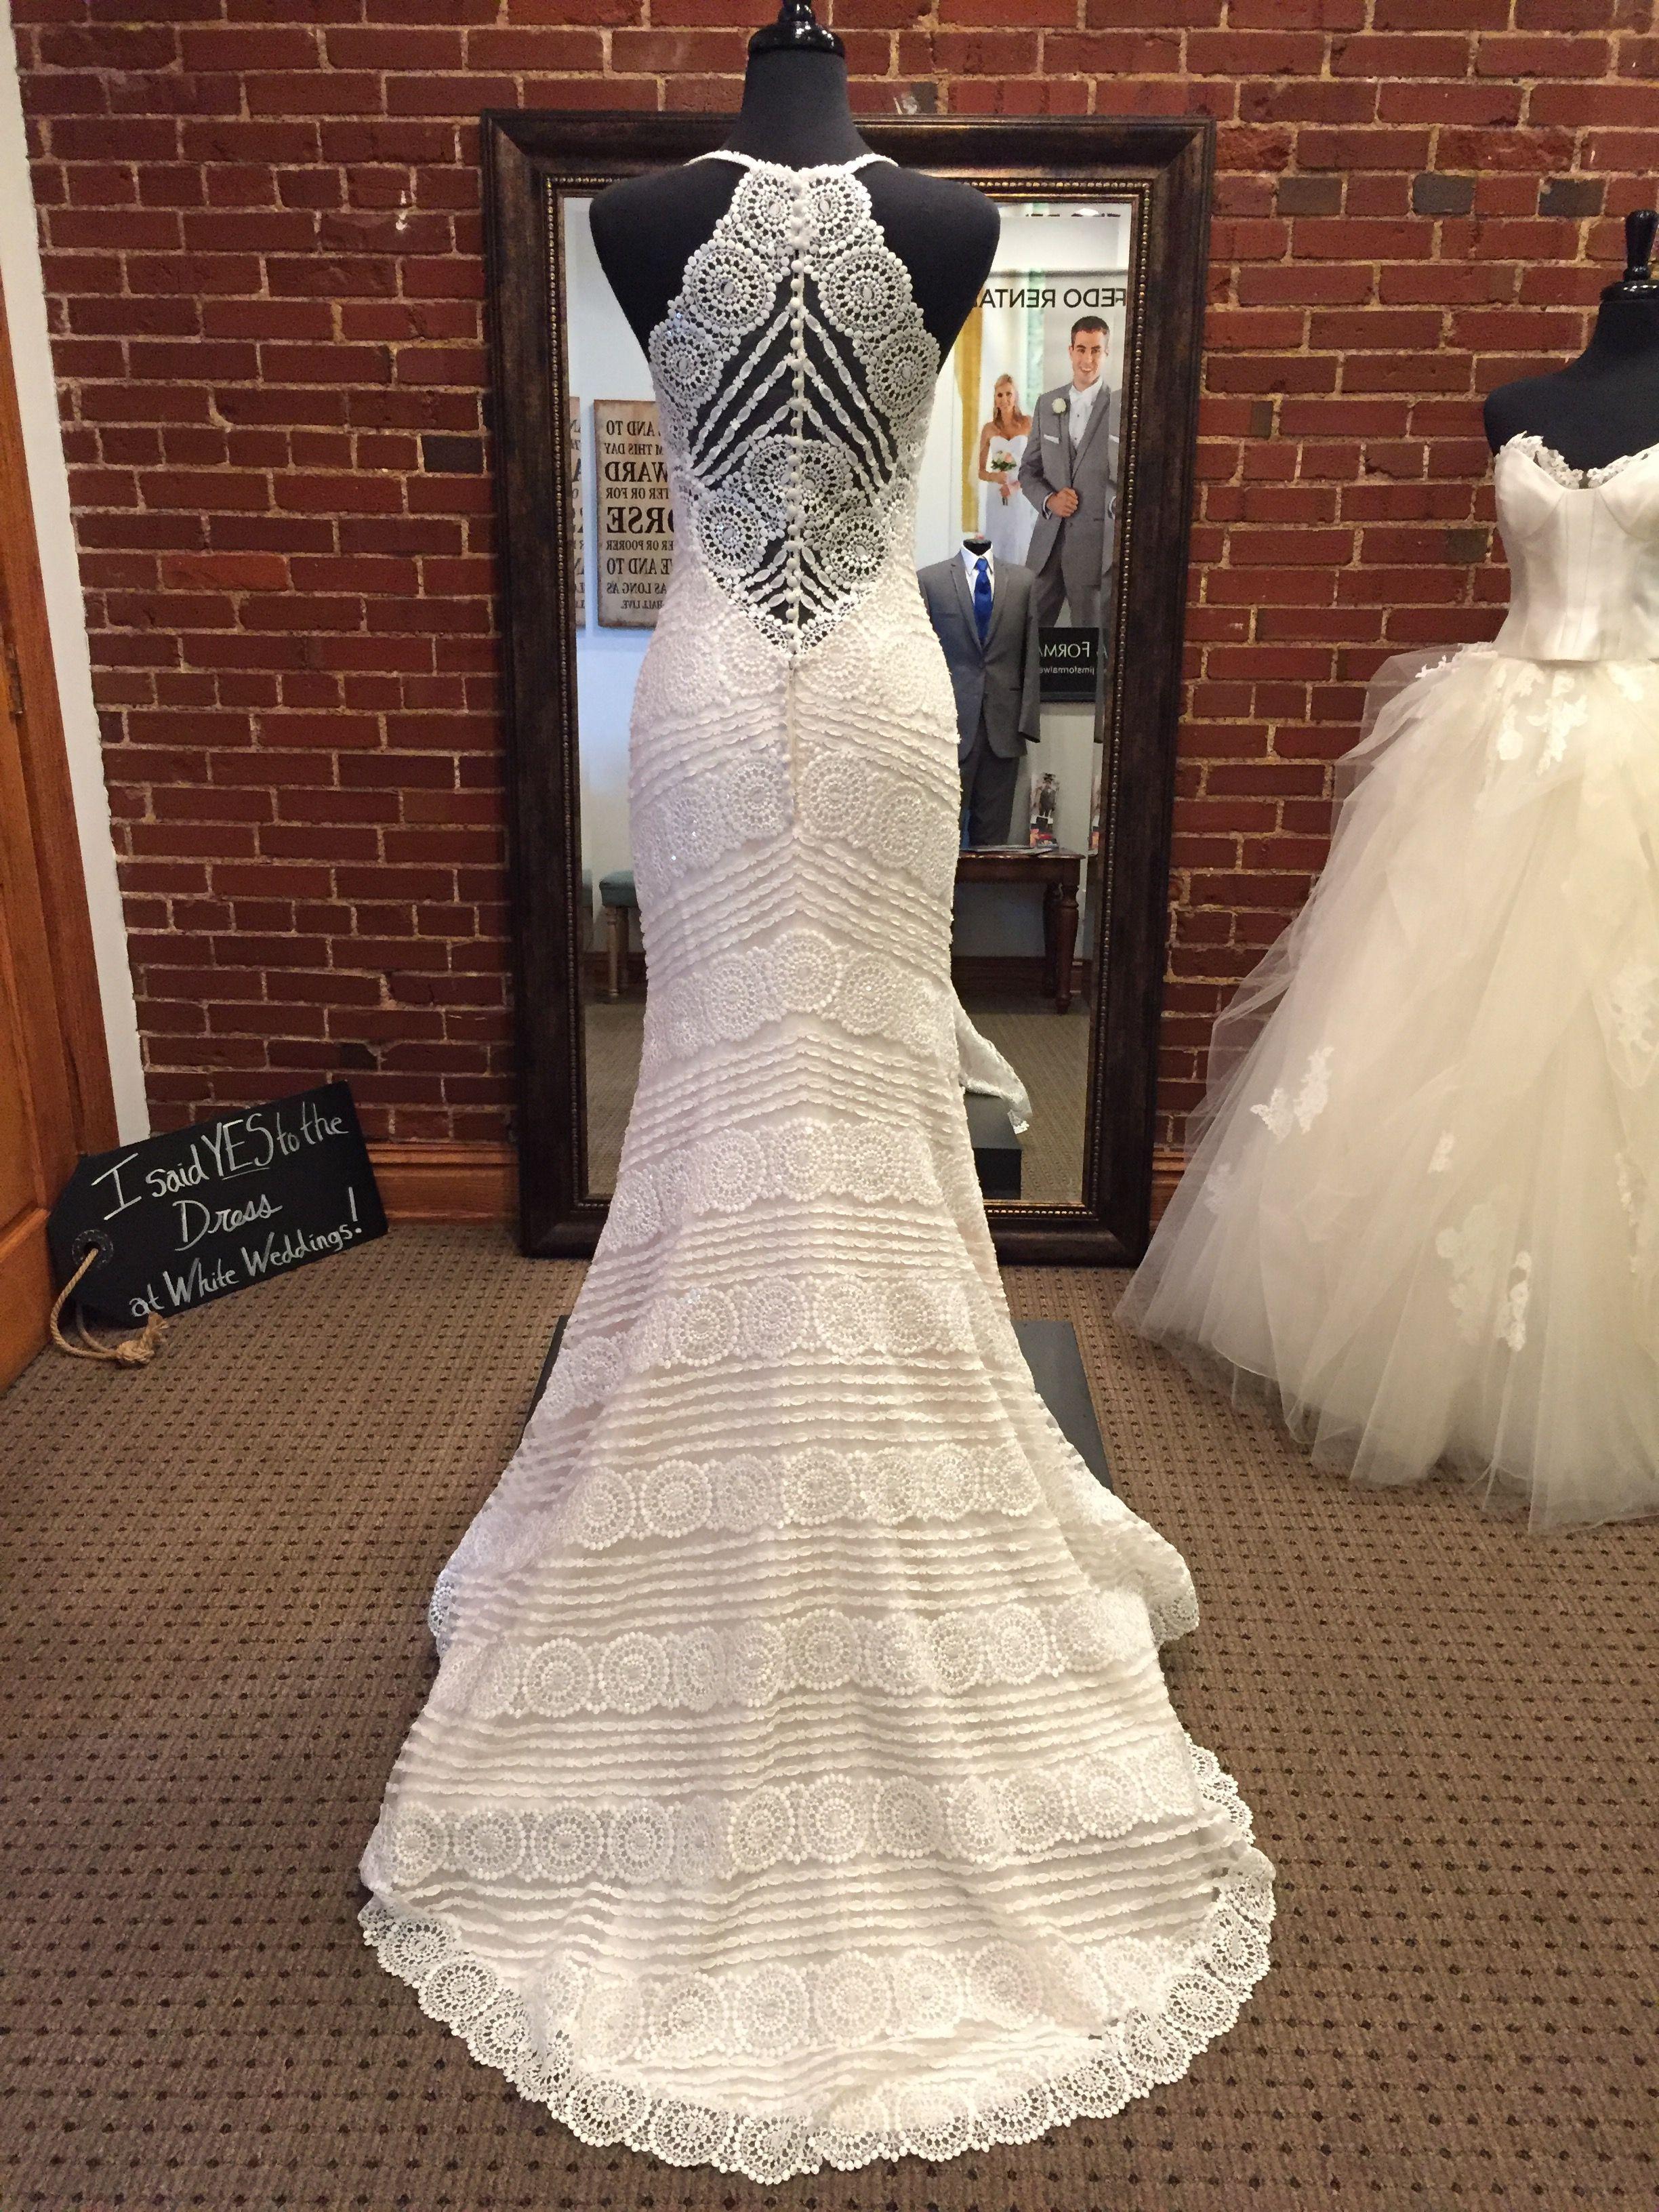 The perfect boho wedding dress bexley features a unique lace design